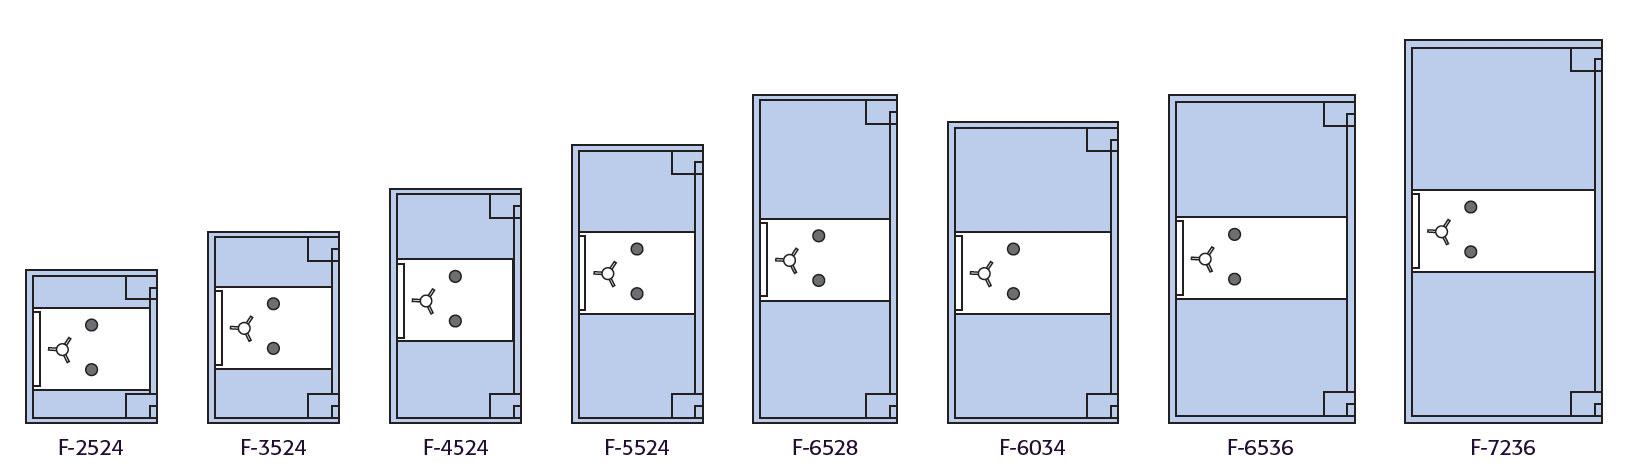 TL-30_box-diagrams.jpg